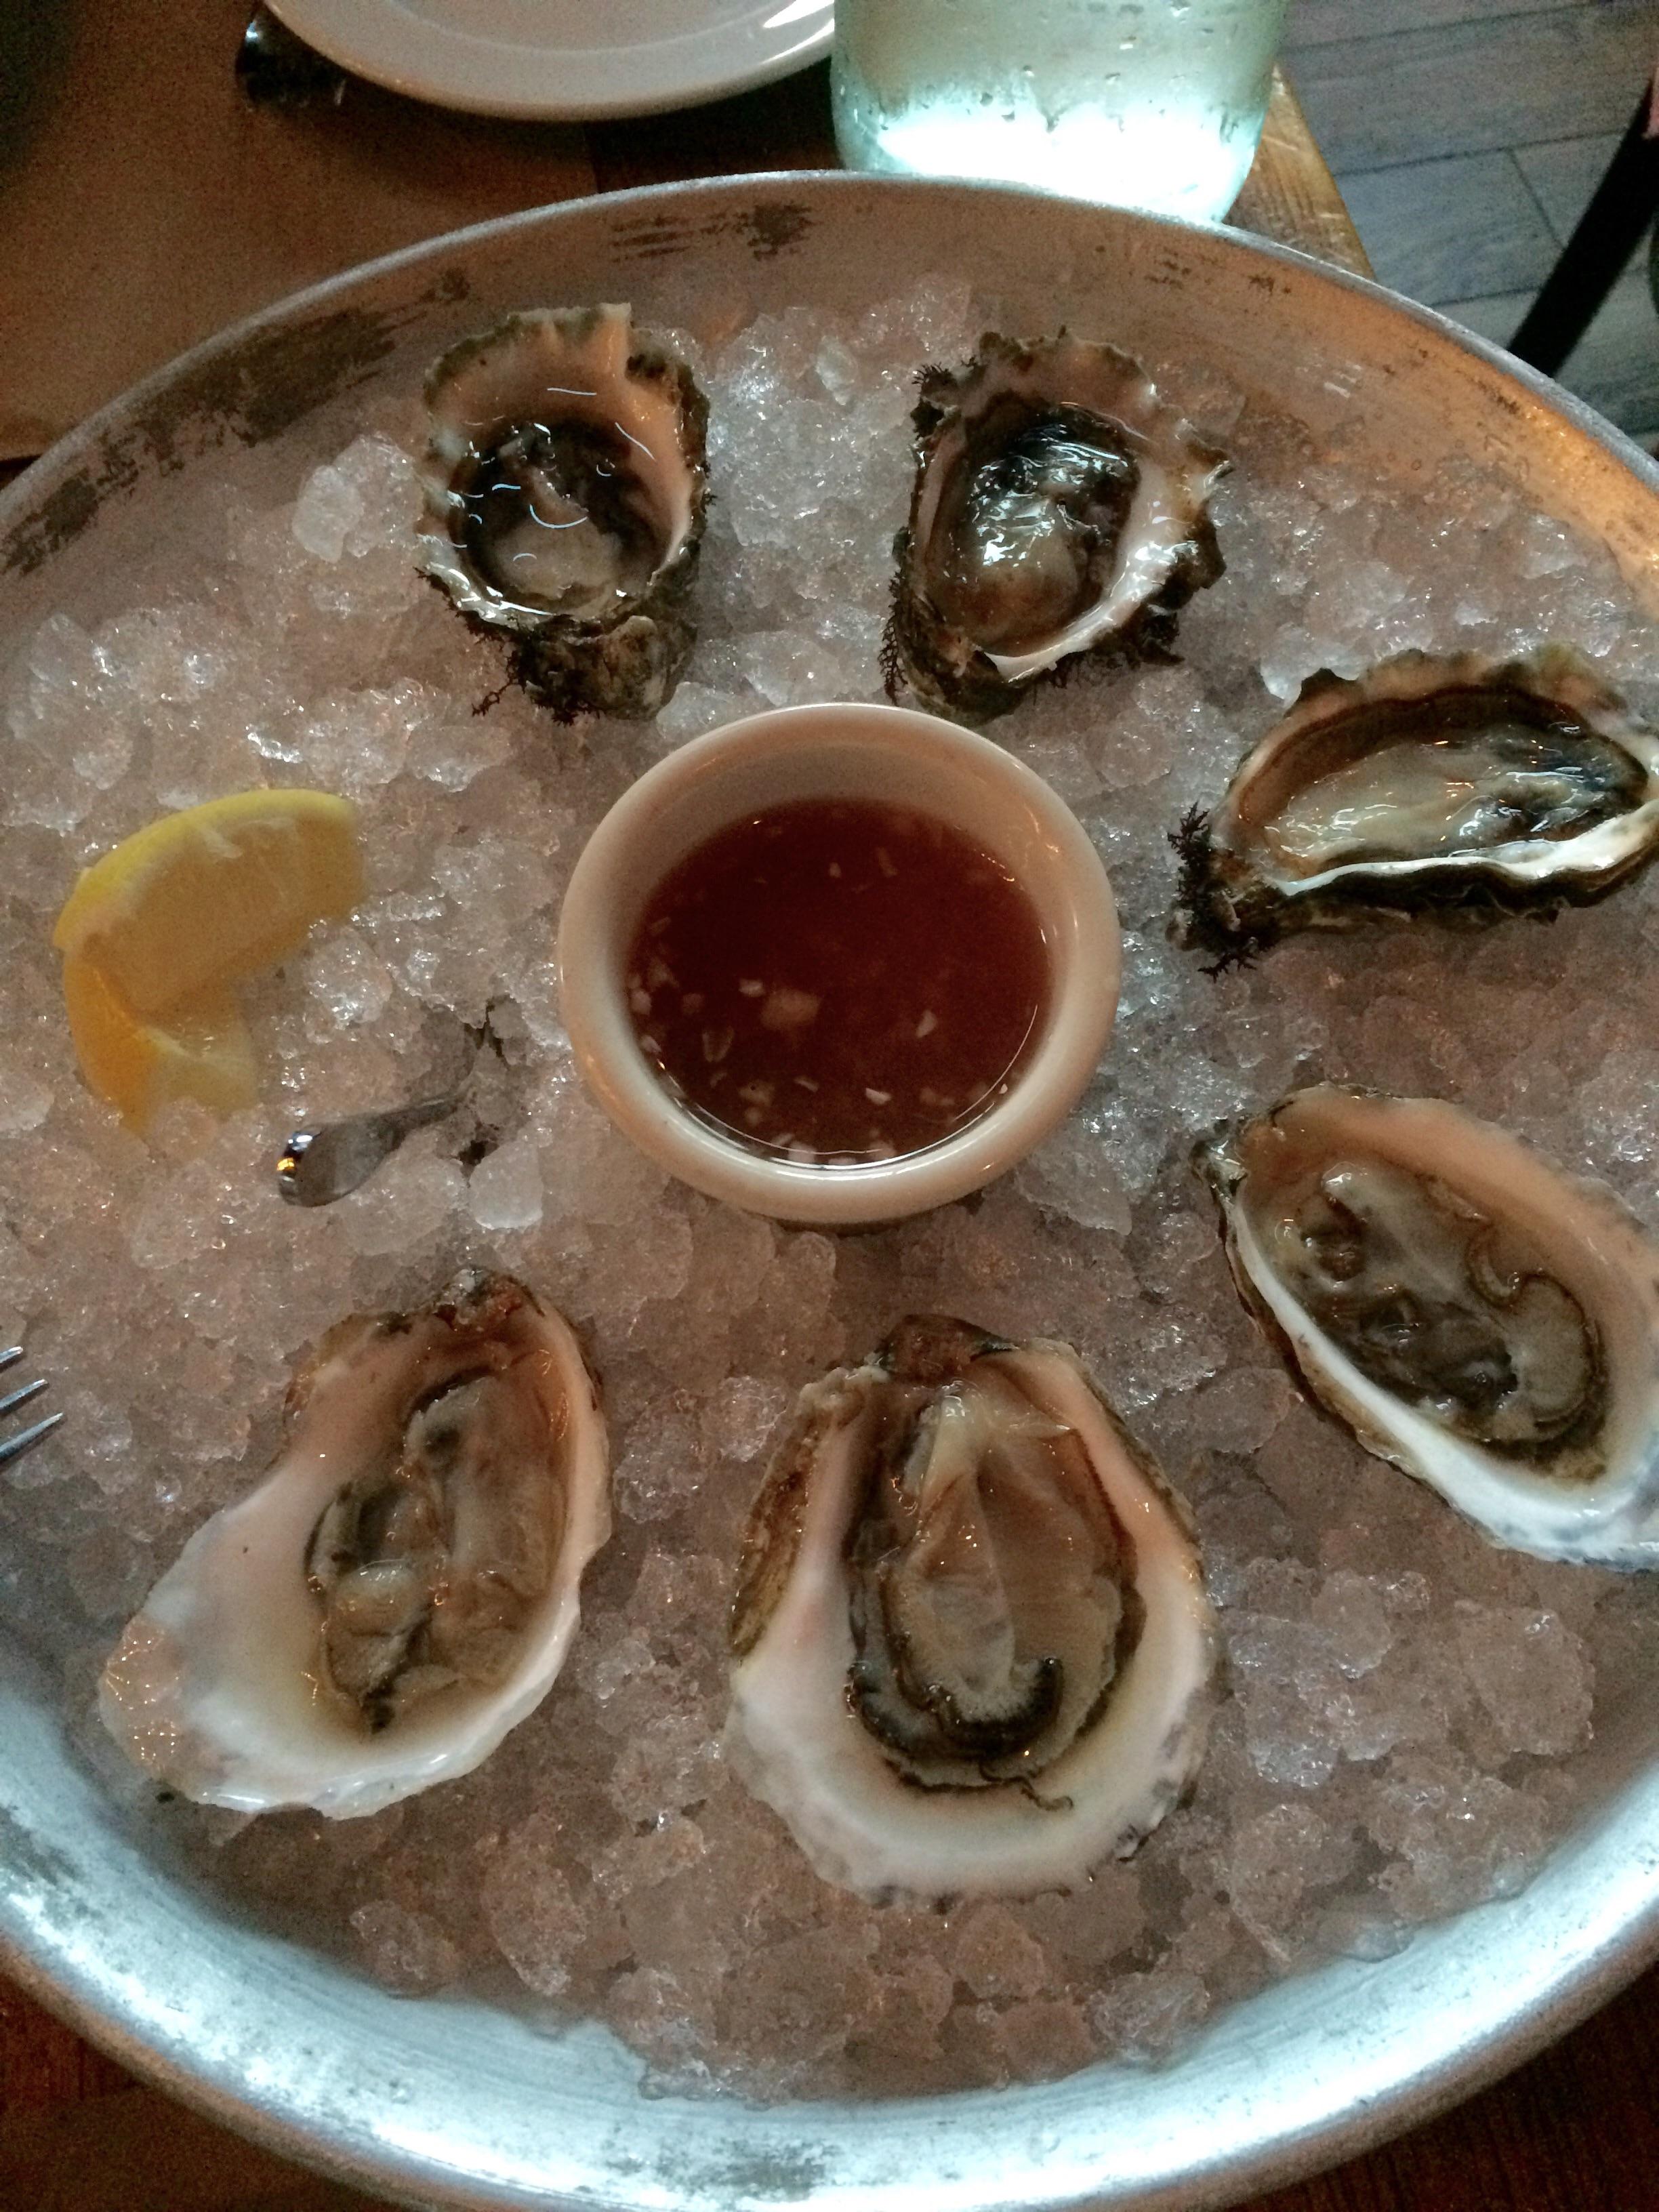 Publican oysters + hama hama.